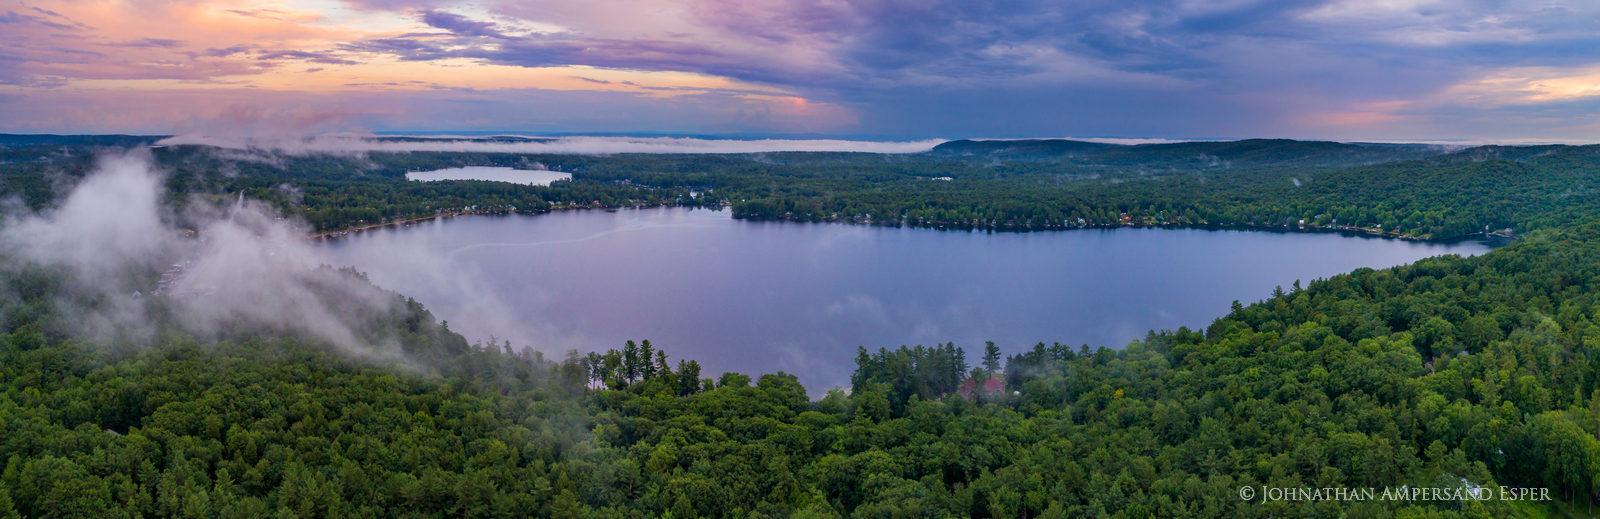 Caroga Lake,West Caroga Lake,drone,panorama,summer,2019,